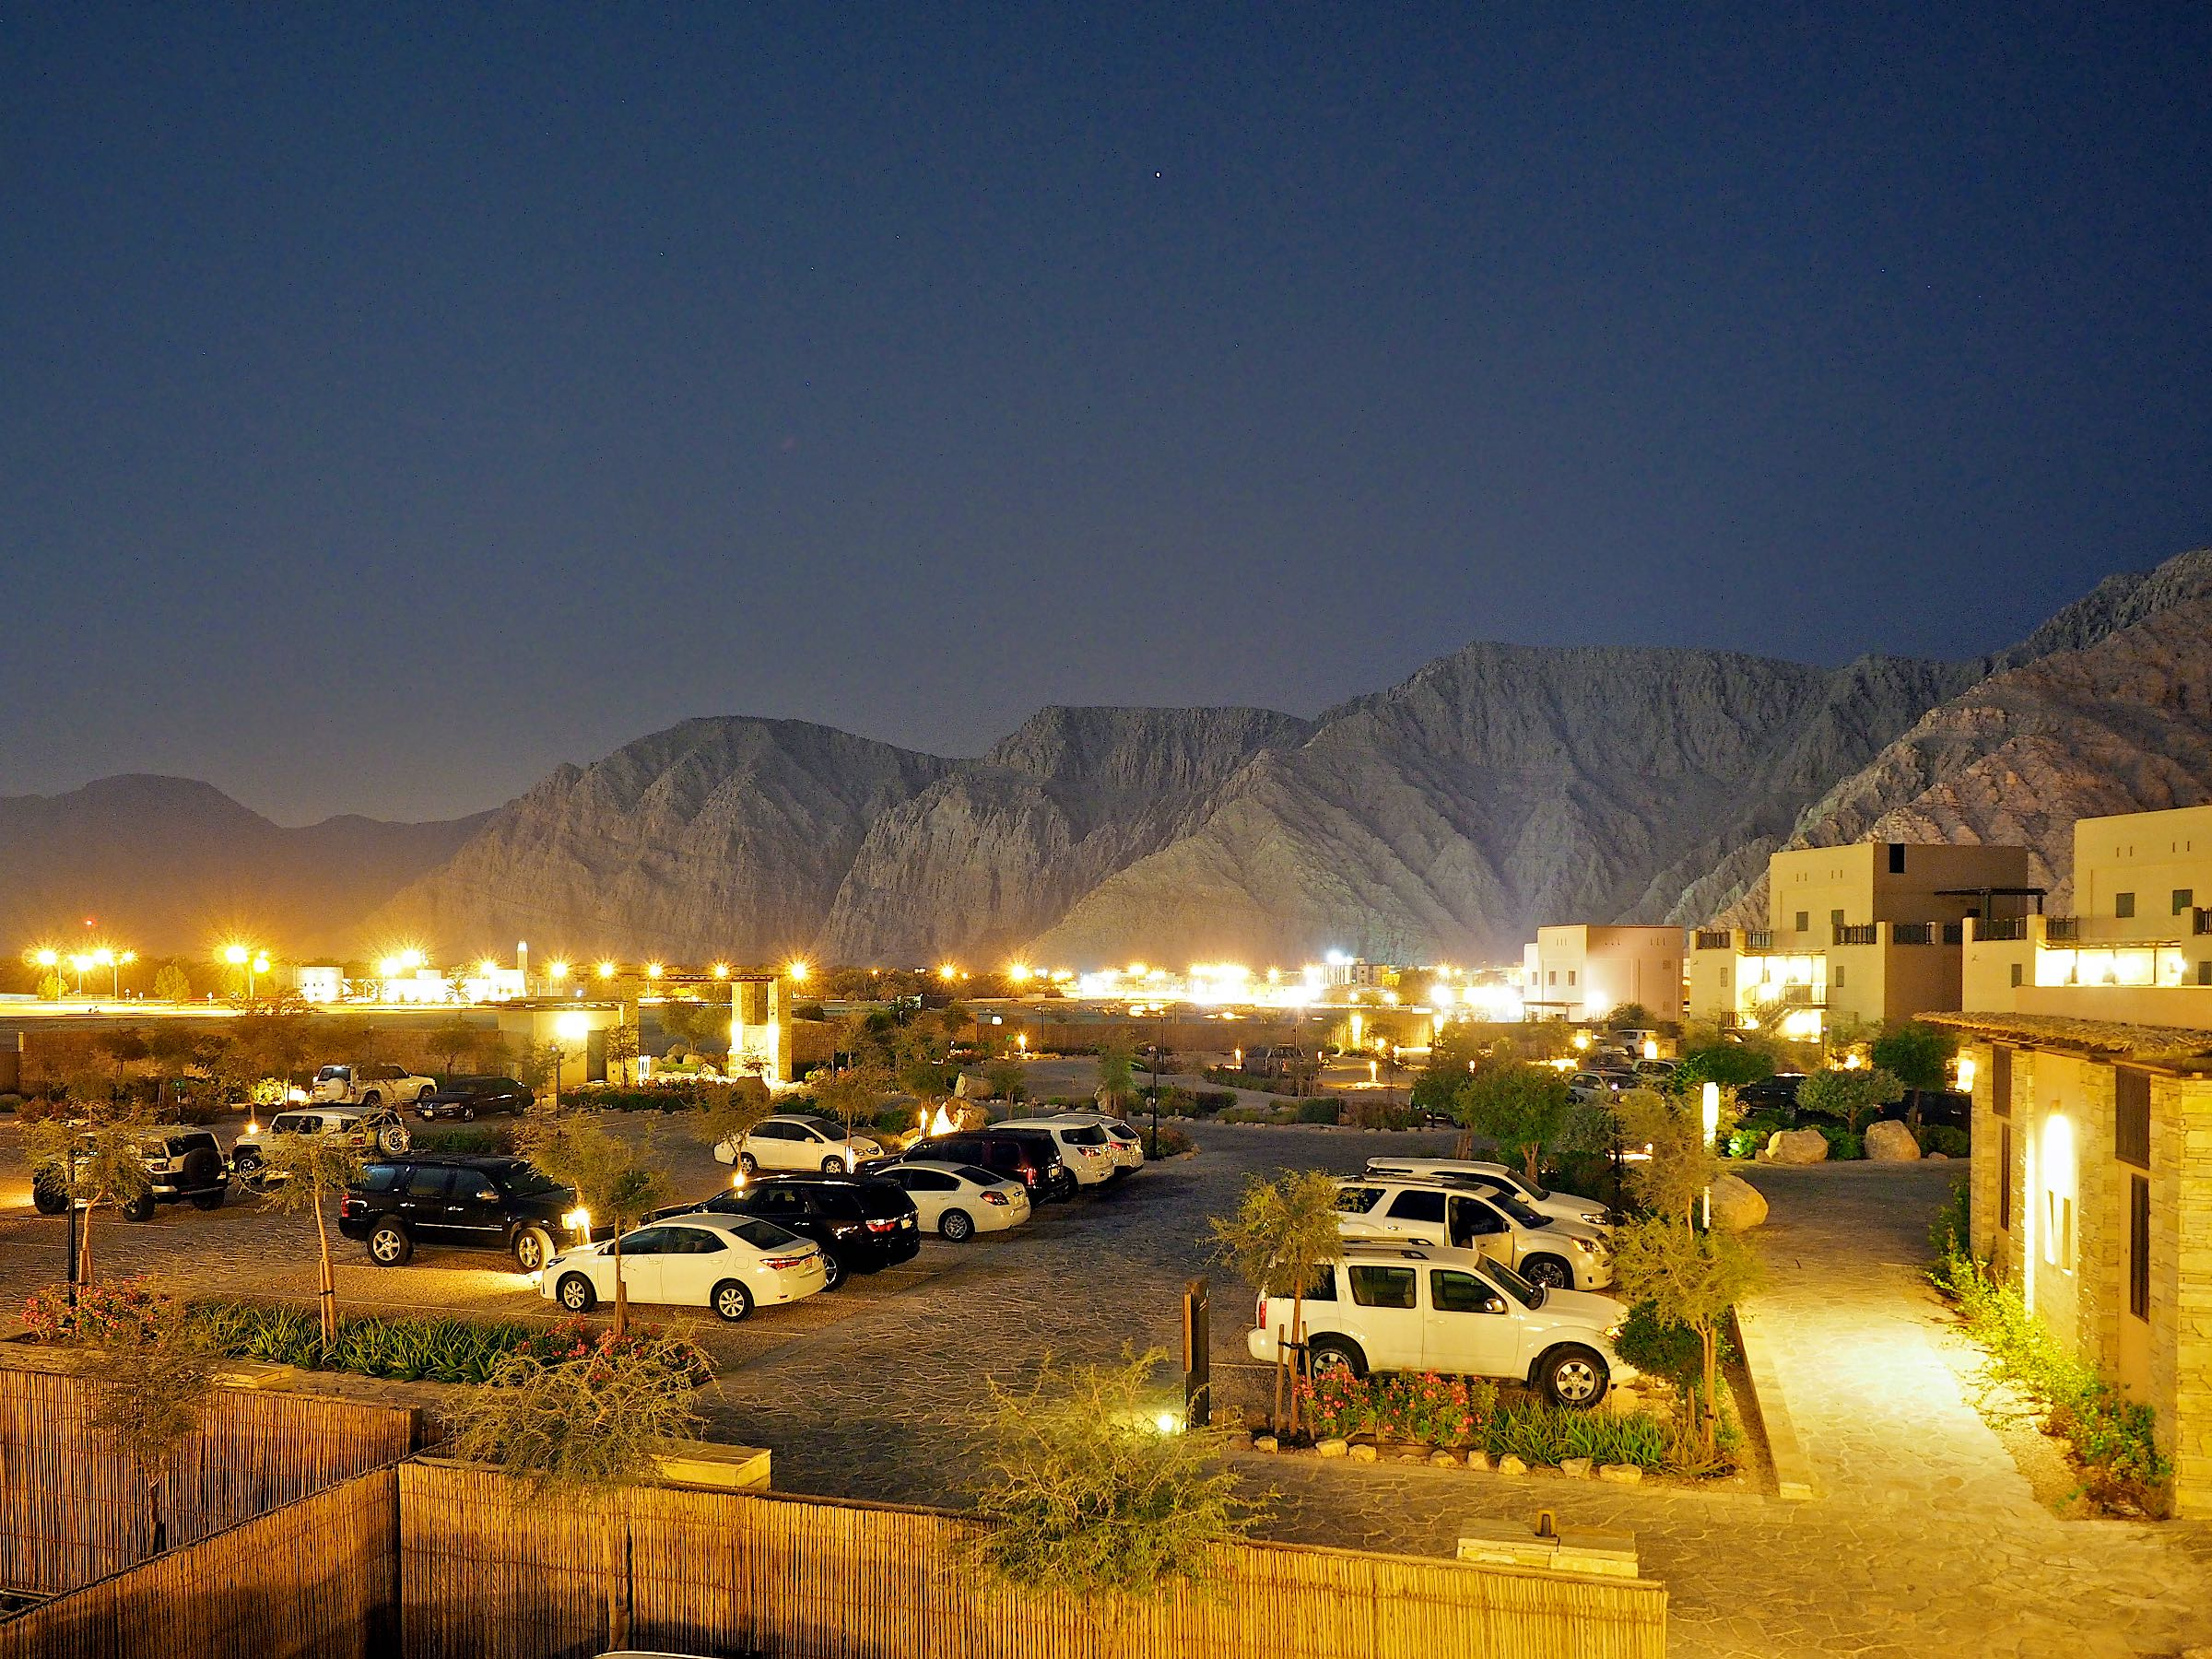 View from Atana Musandam